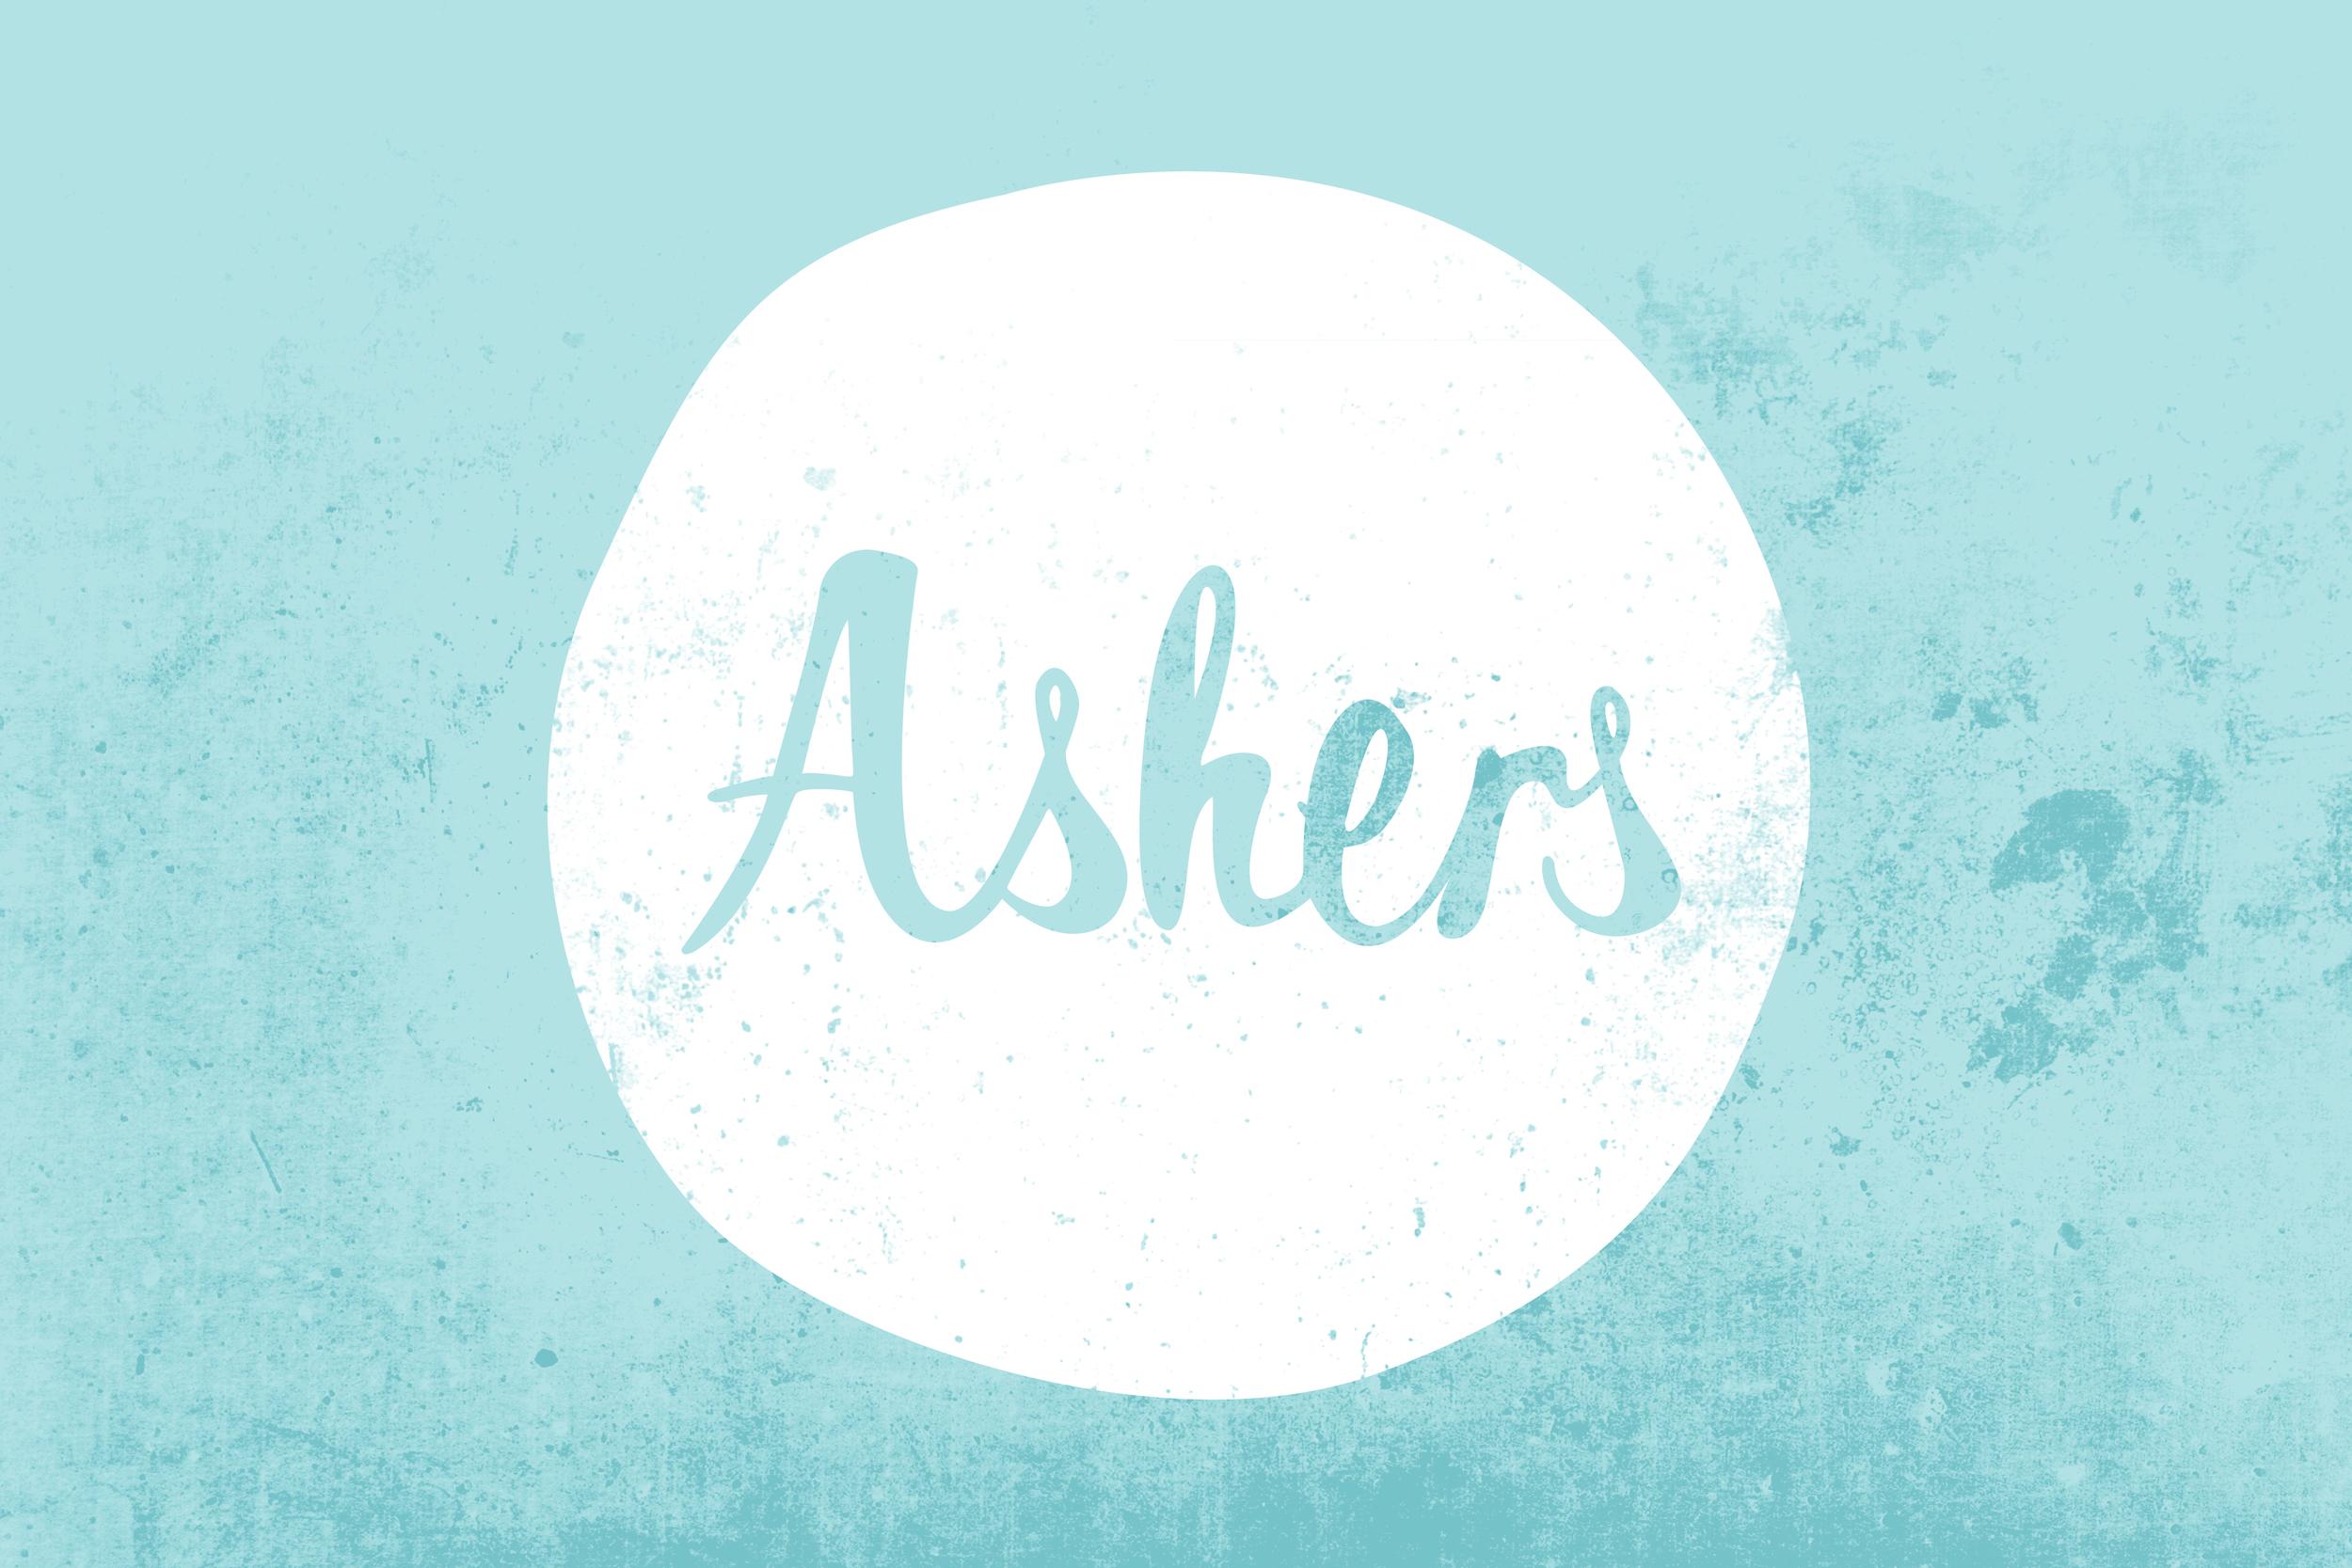 ashers web graphics templatelogo2.jpg